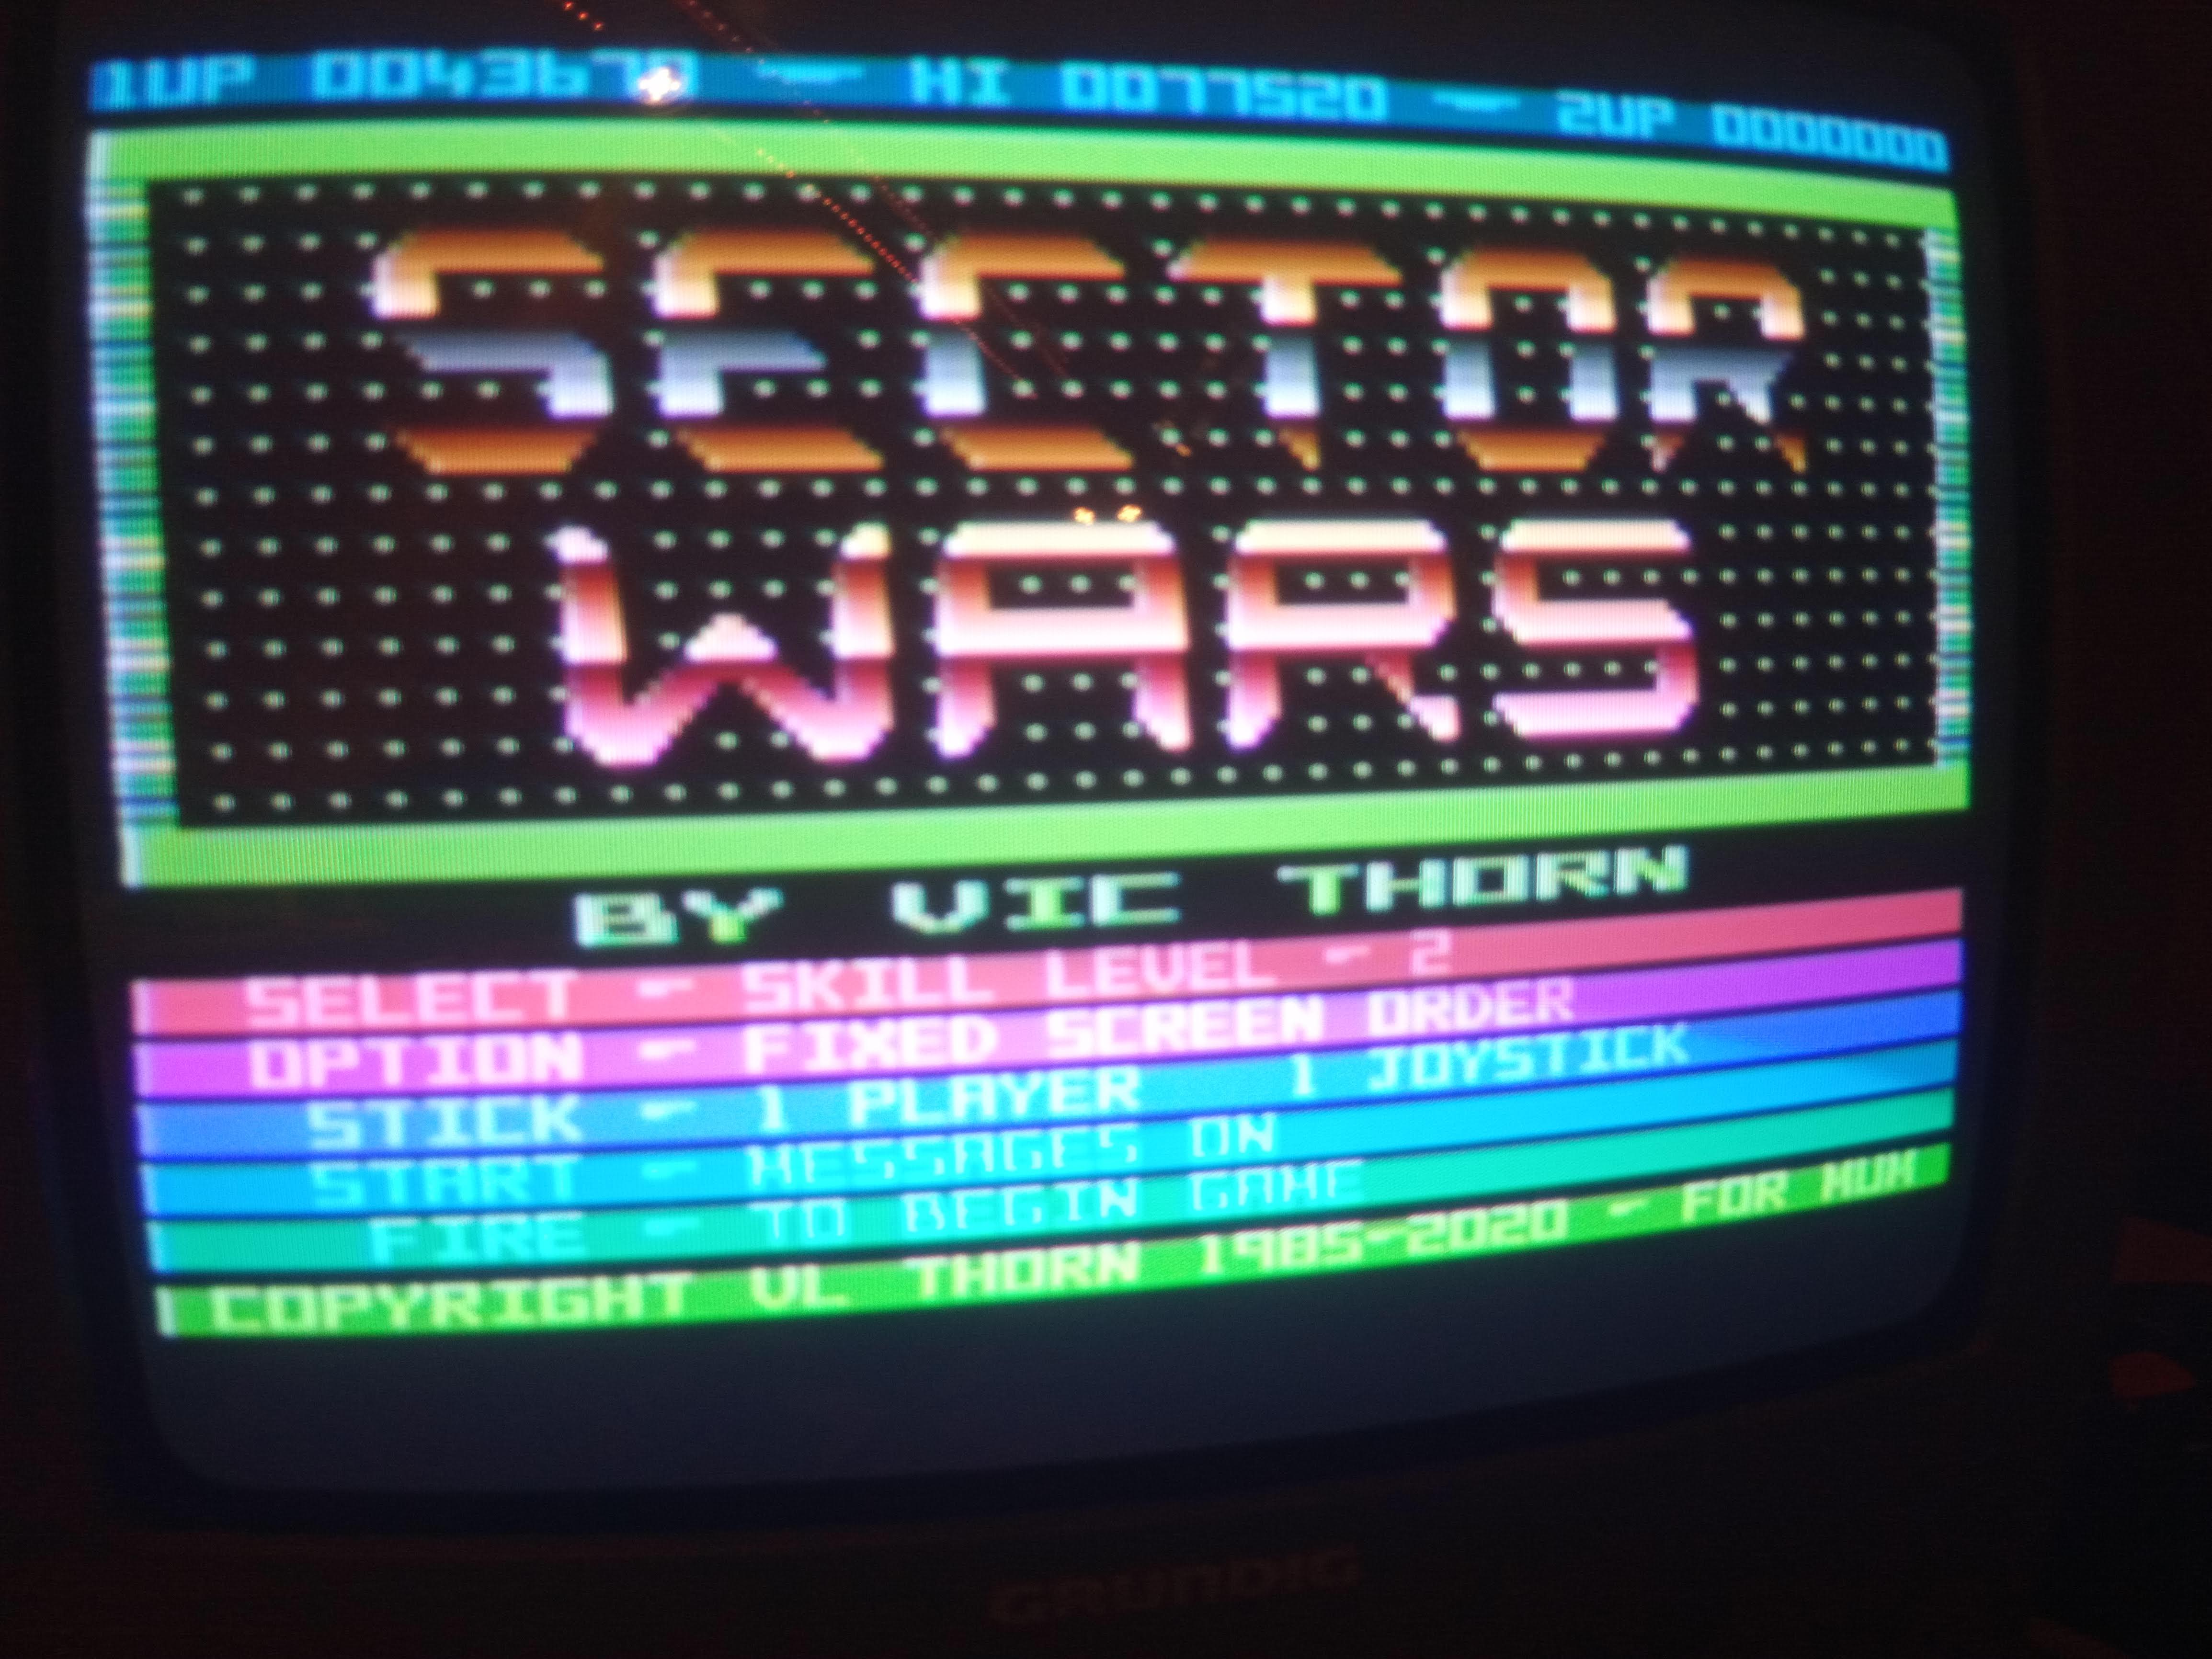 Bunsen: Sector Wars [Skill Level 1] (Atari 400/800/XL/XE) 77,520 points on 2020-07-09 15:39:42